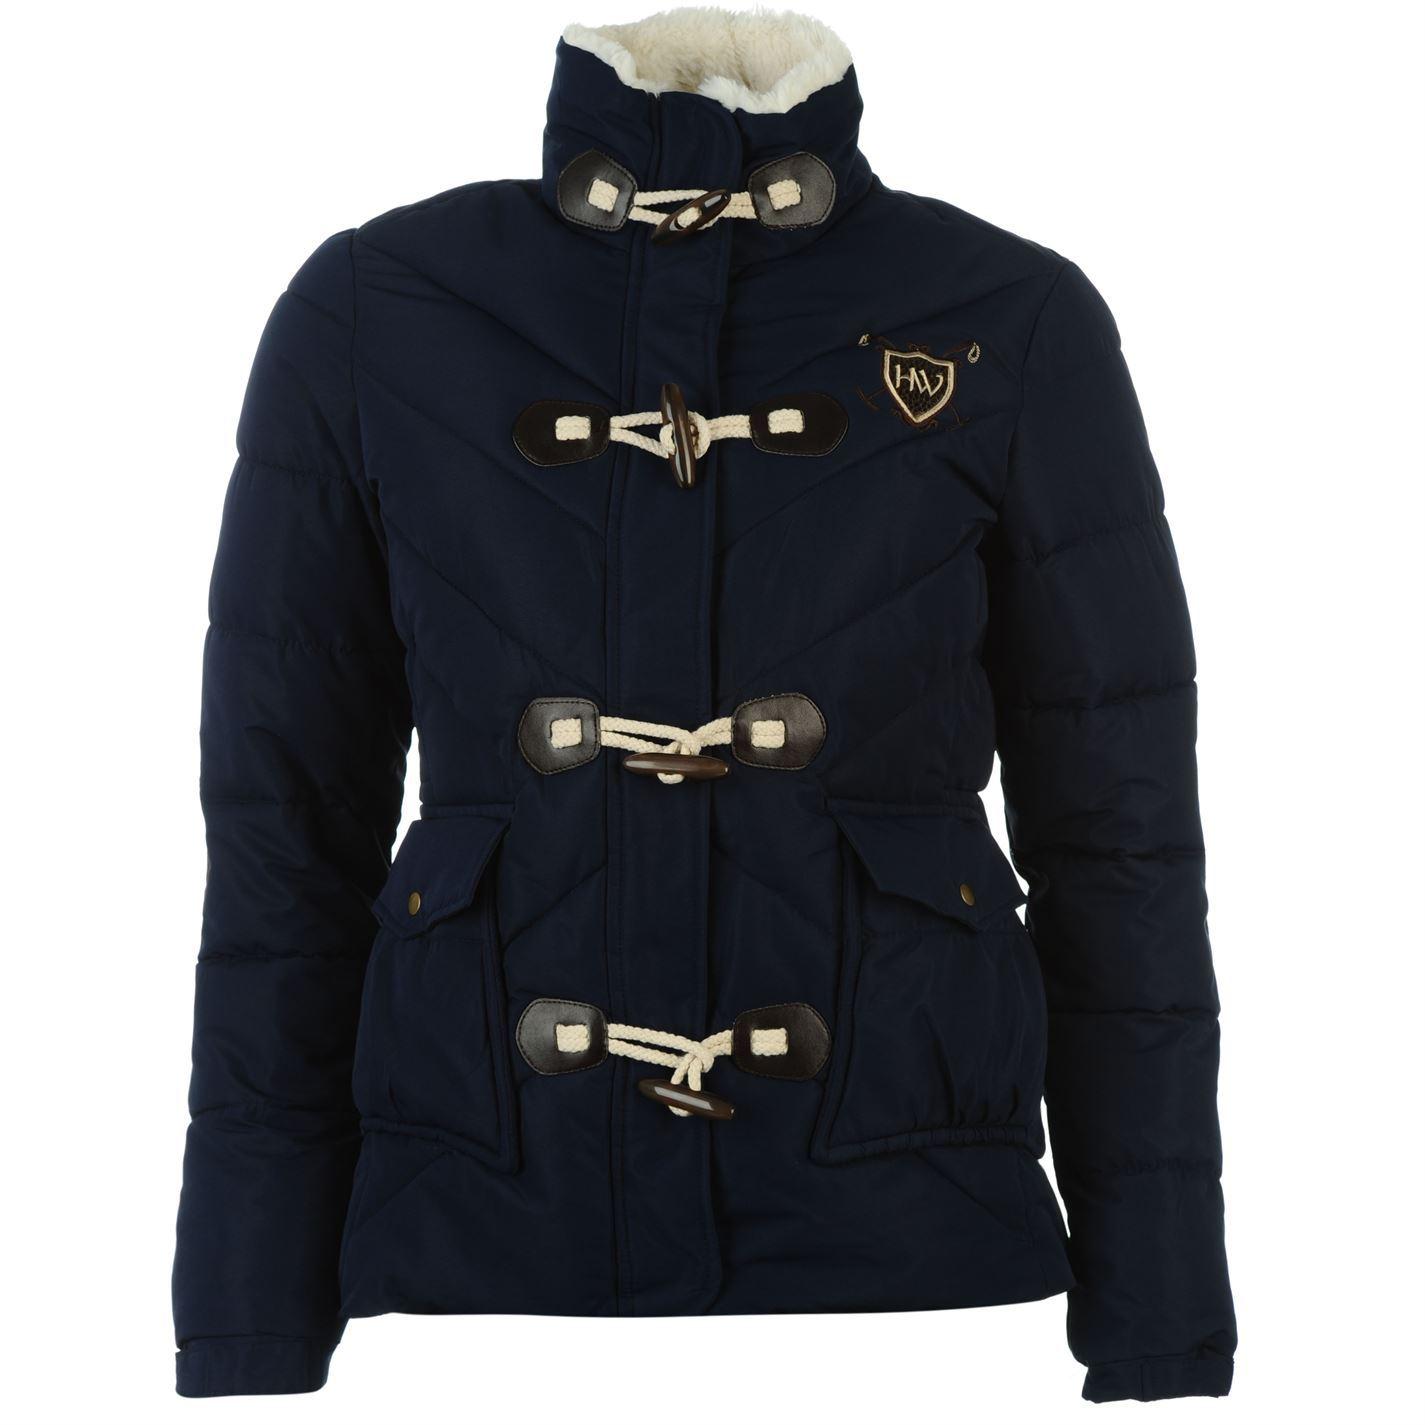 Horseware Womens Ladies Polo Biba Horse Riding Jacket Long Sleeve Coat Top | EBay